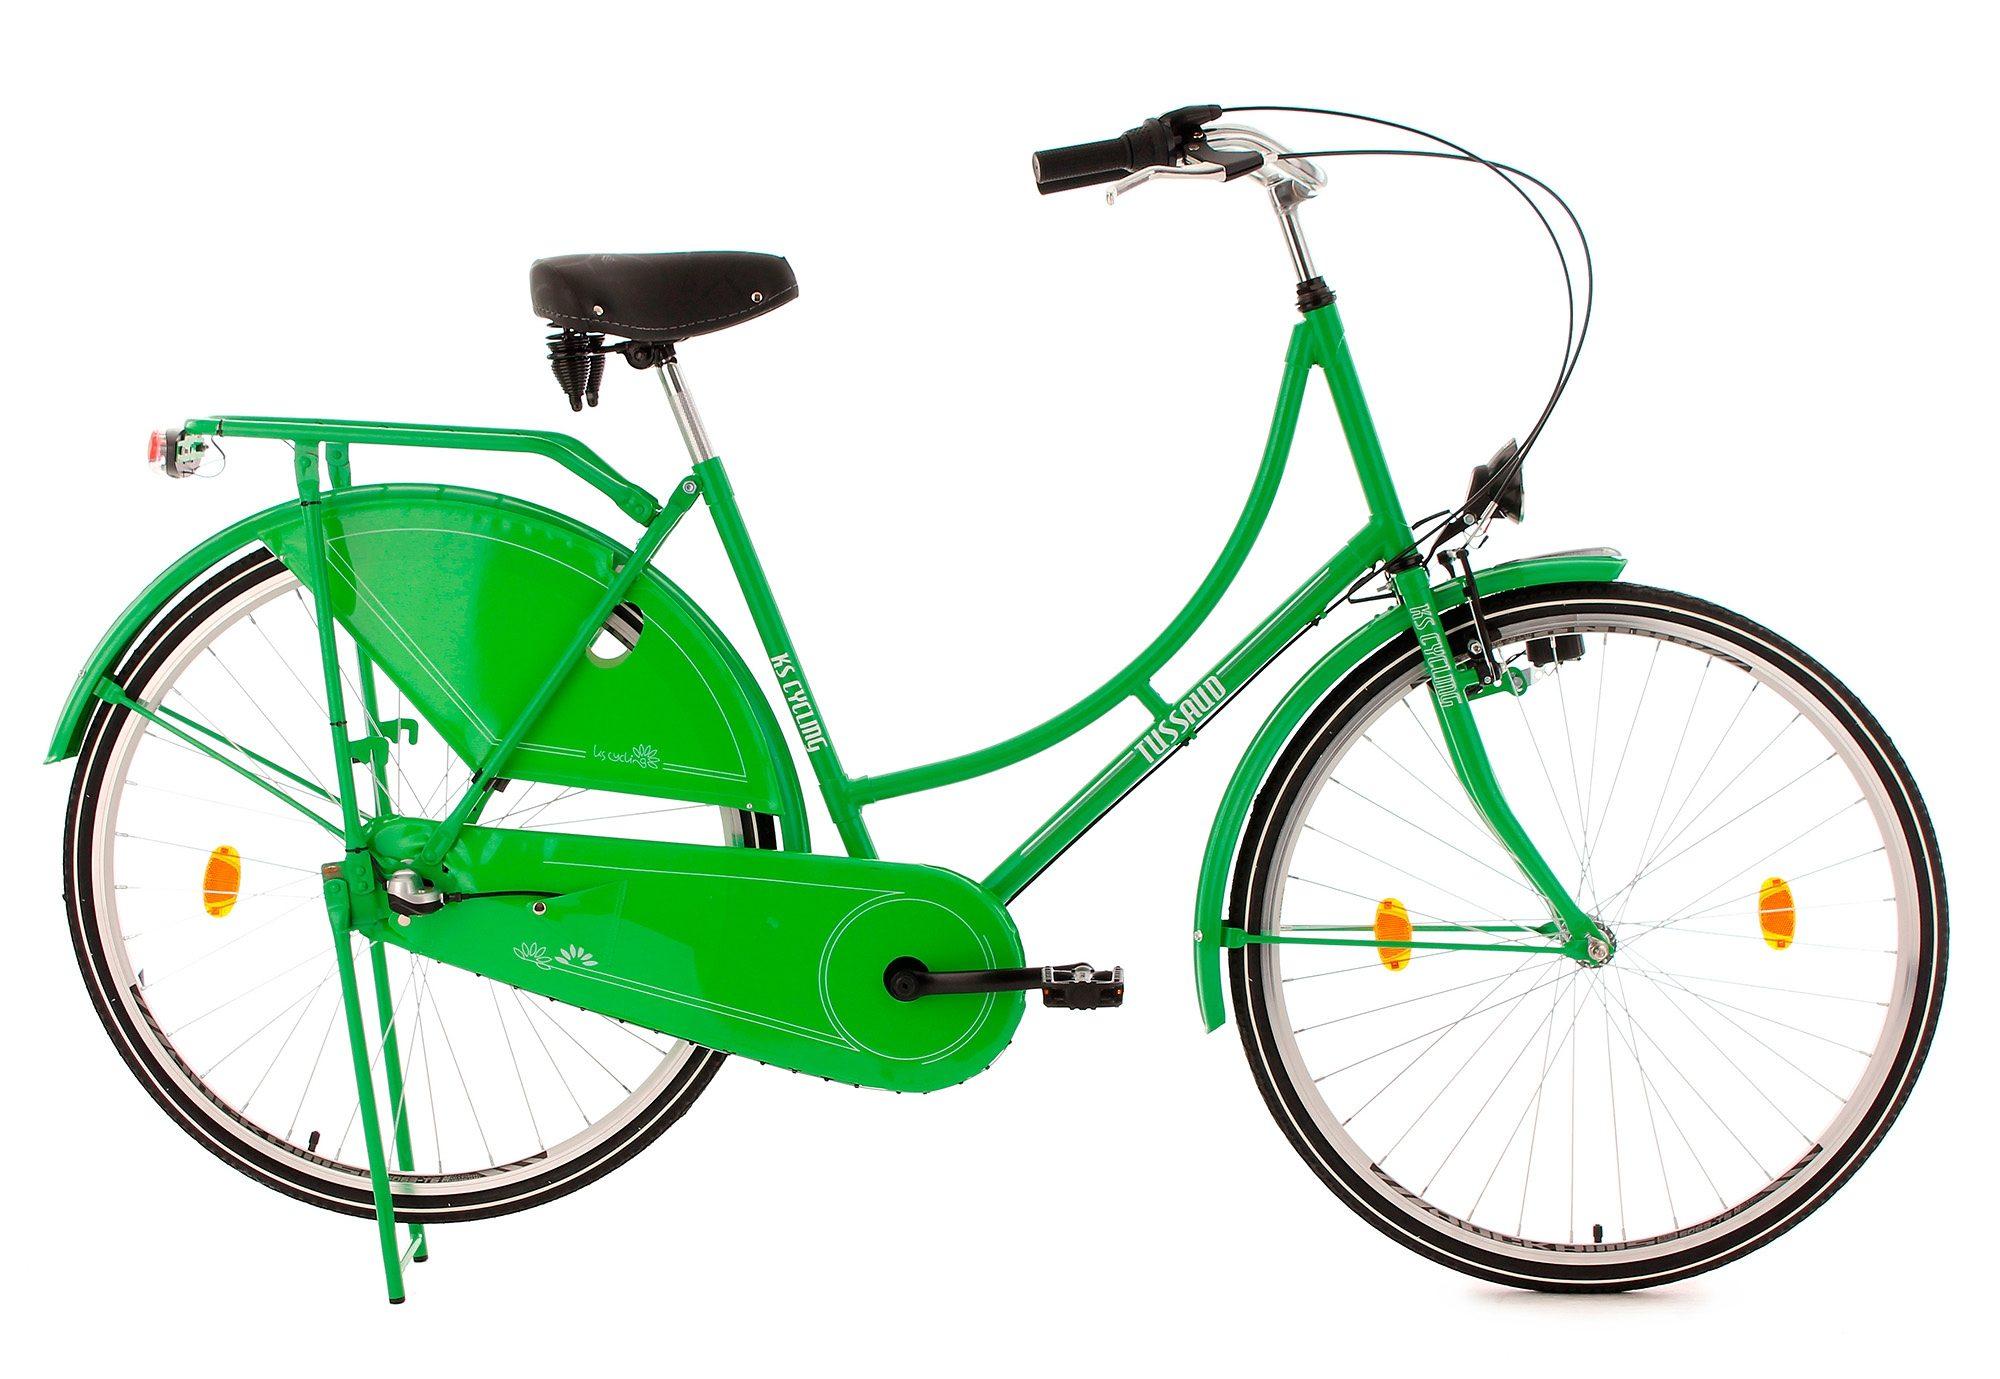 Hollandrad, 28 Zoll, 3 Gang Nabenschaltung, grün, »Tussaud«, KS Cycling